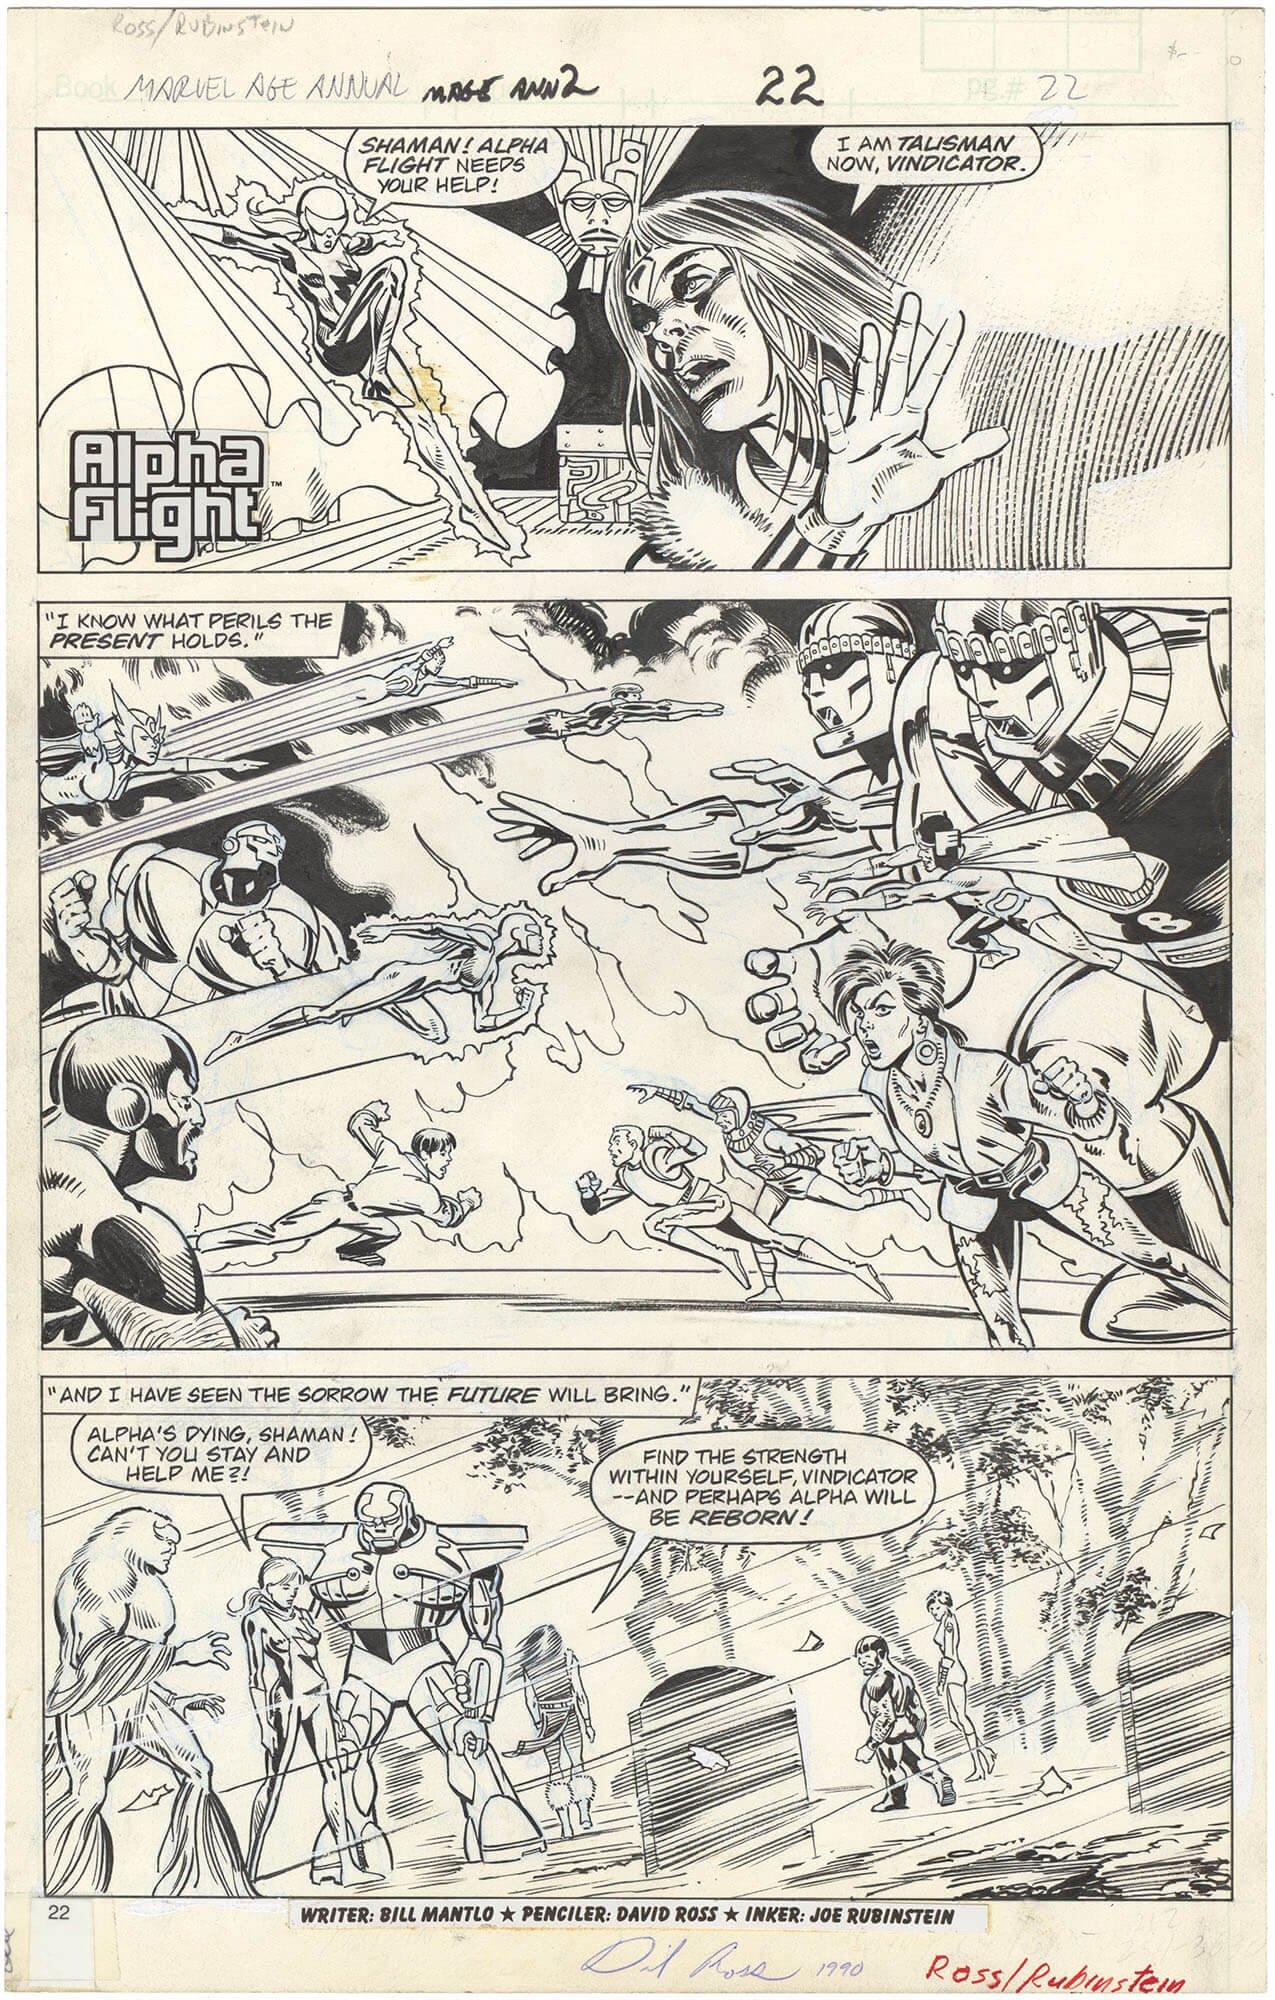 Marvel Age Annual #2 p22 (Alpha Flight)